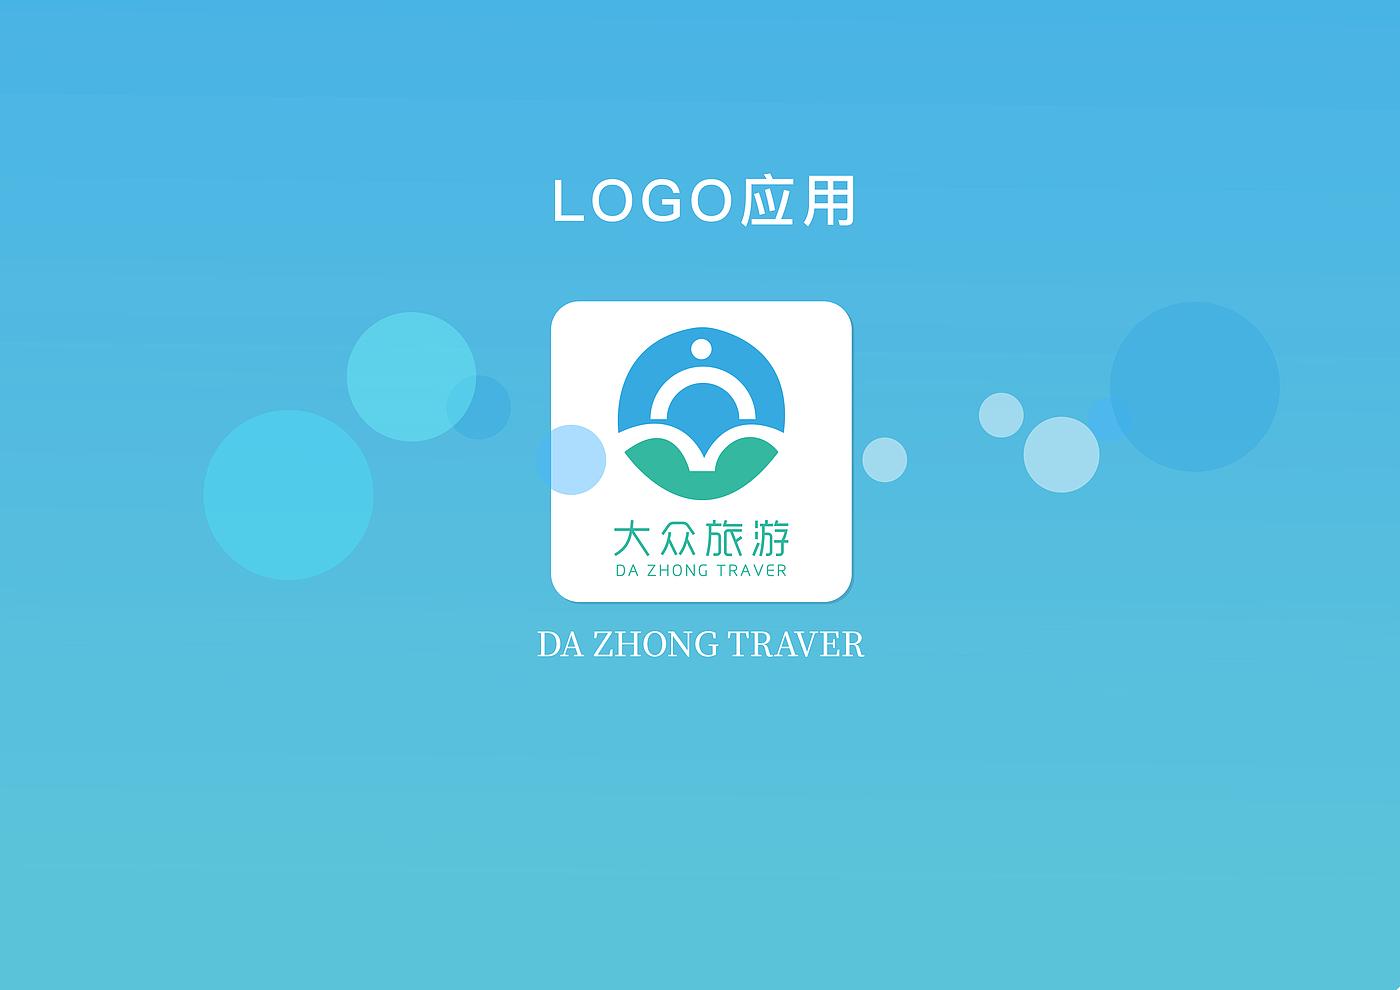 logo,旅行,旅游,清新,